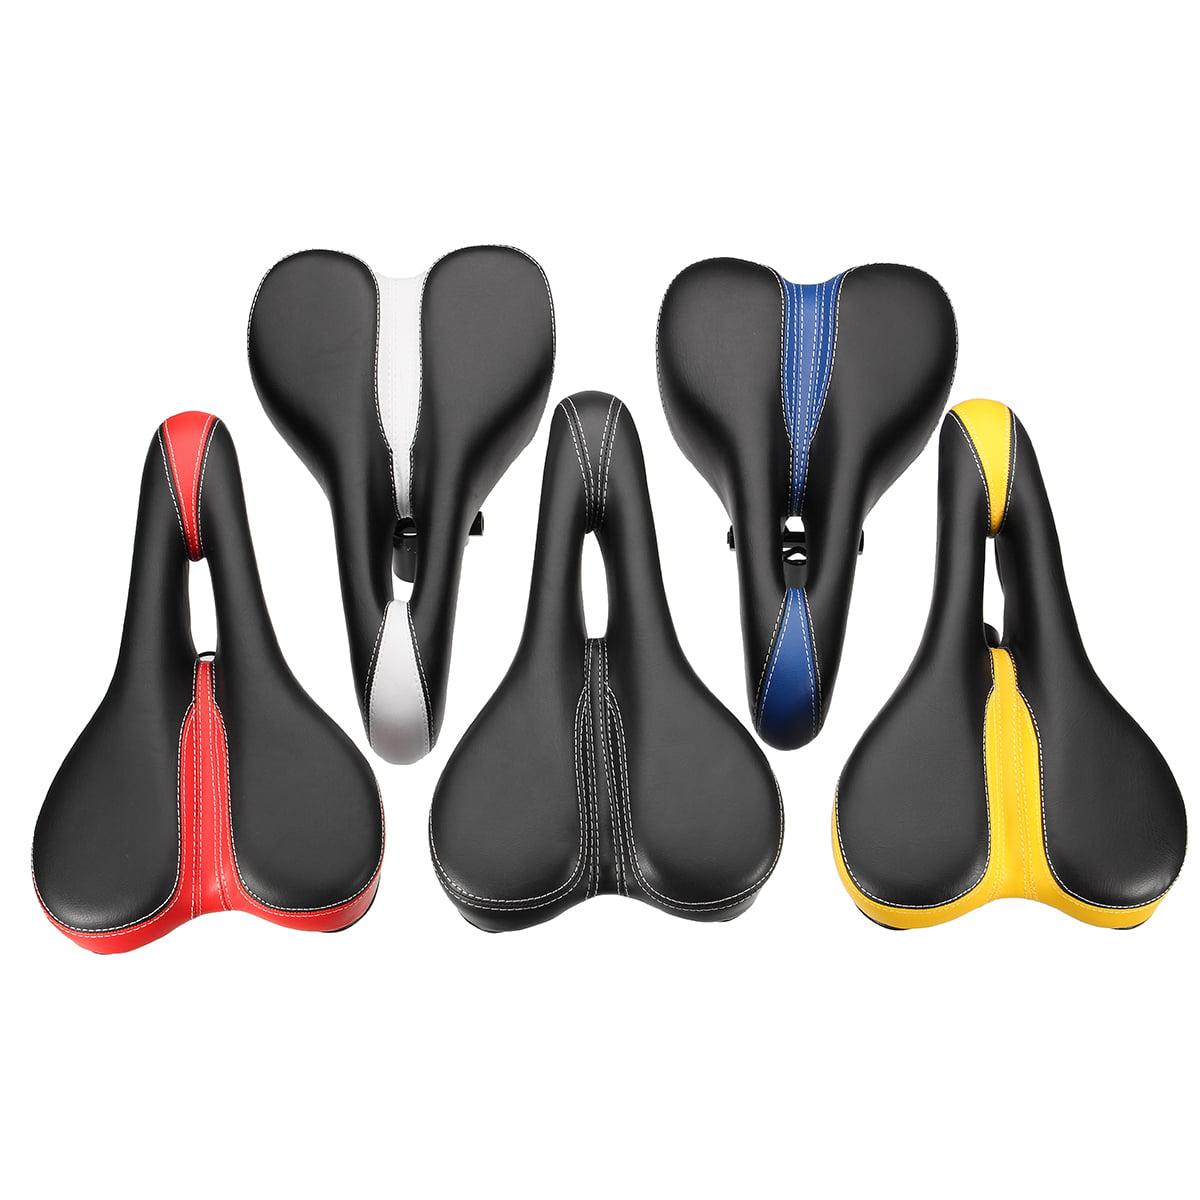 Soft Mountain Bike Cycle Gel Pad Comfort Bicycle Leather Saddle Seat Cushion YF- 1032